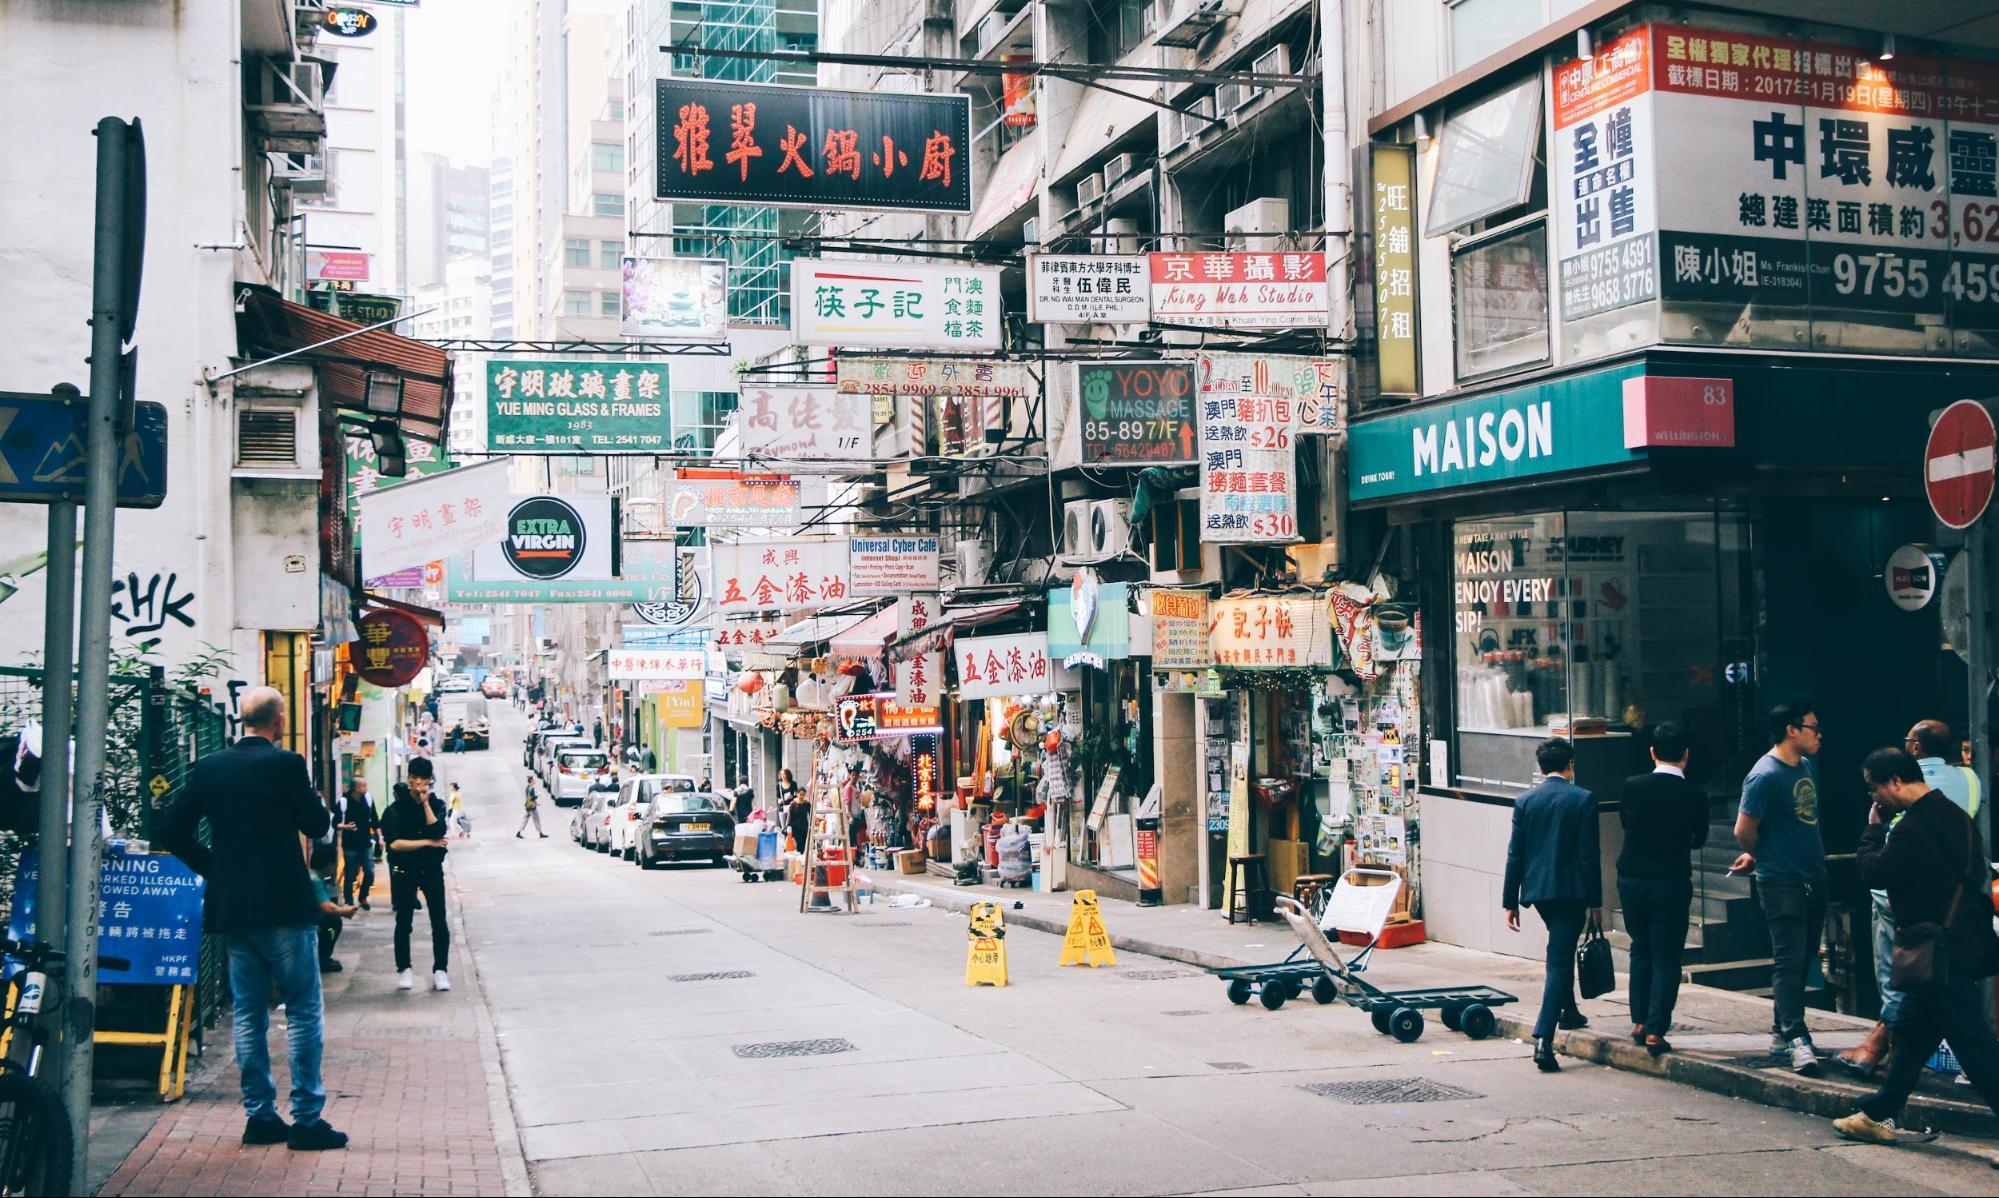 hk transportation